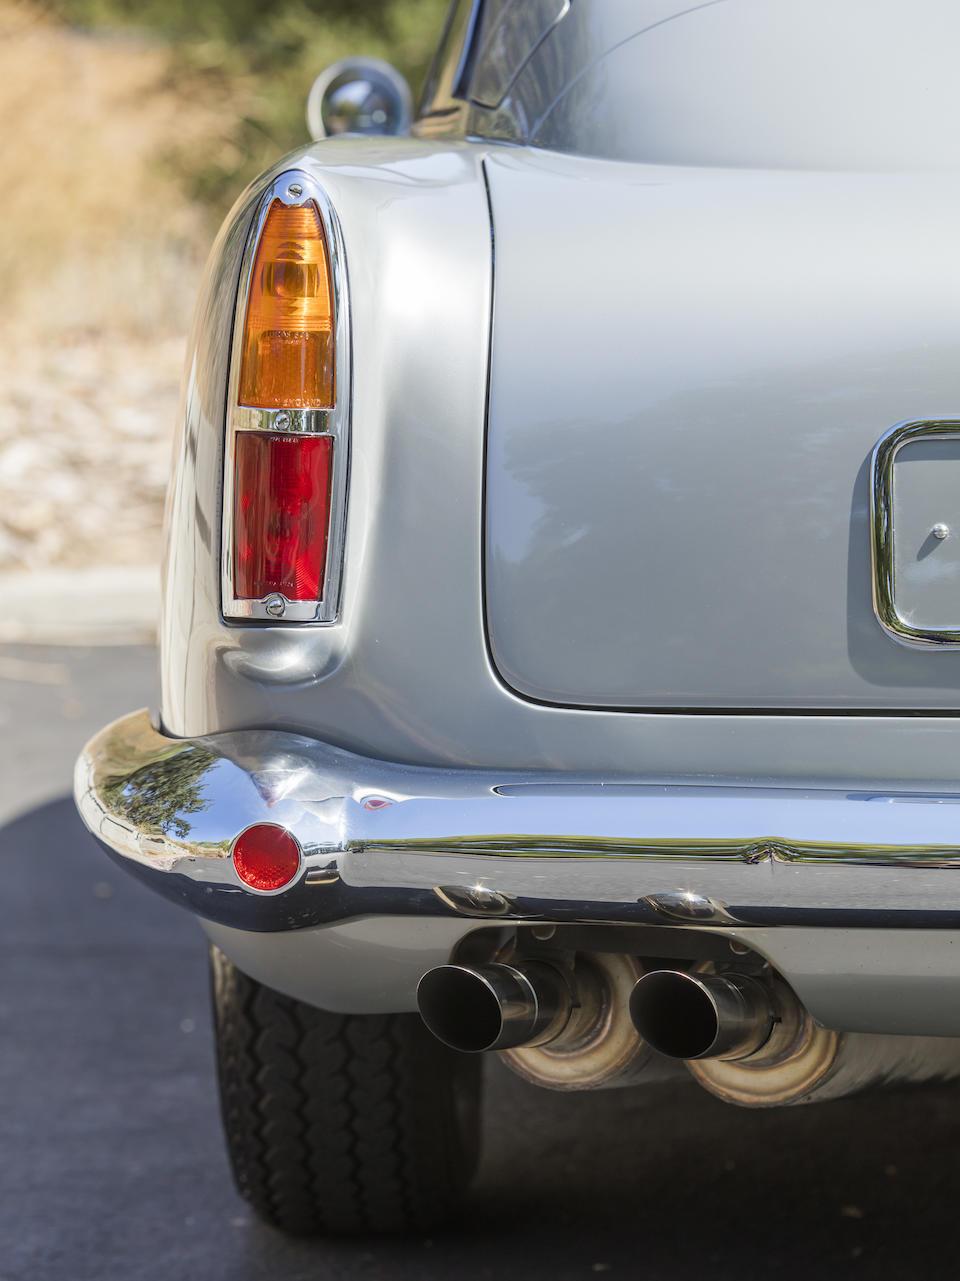 <b>1960 Aston Martin DB4 Series II Sports Saloon</b><br />  Chassis no. DB4/305/R<br /> Engine no. 370/339